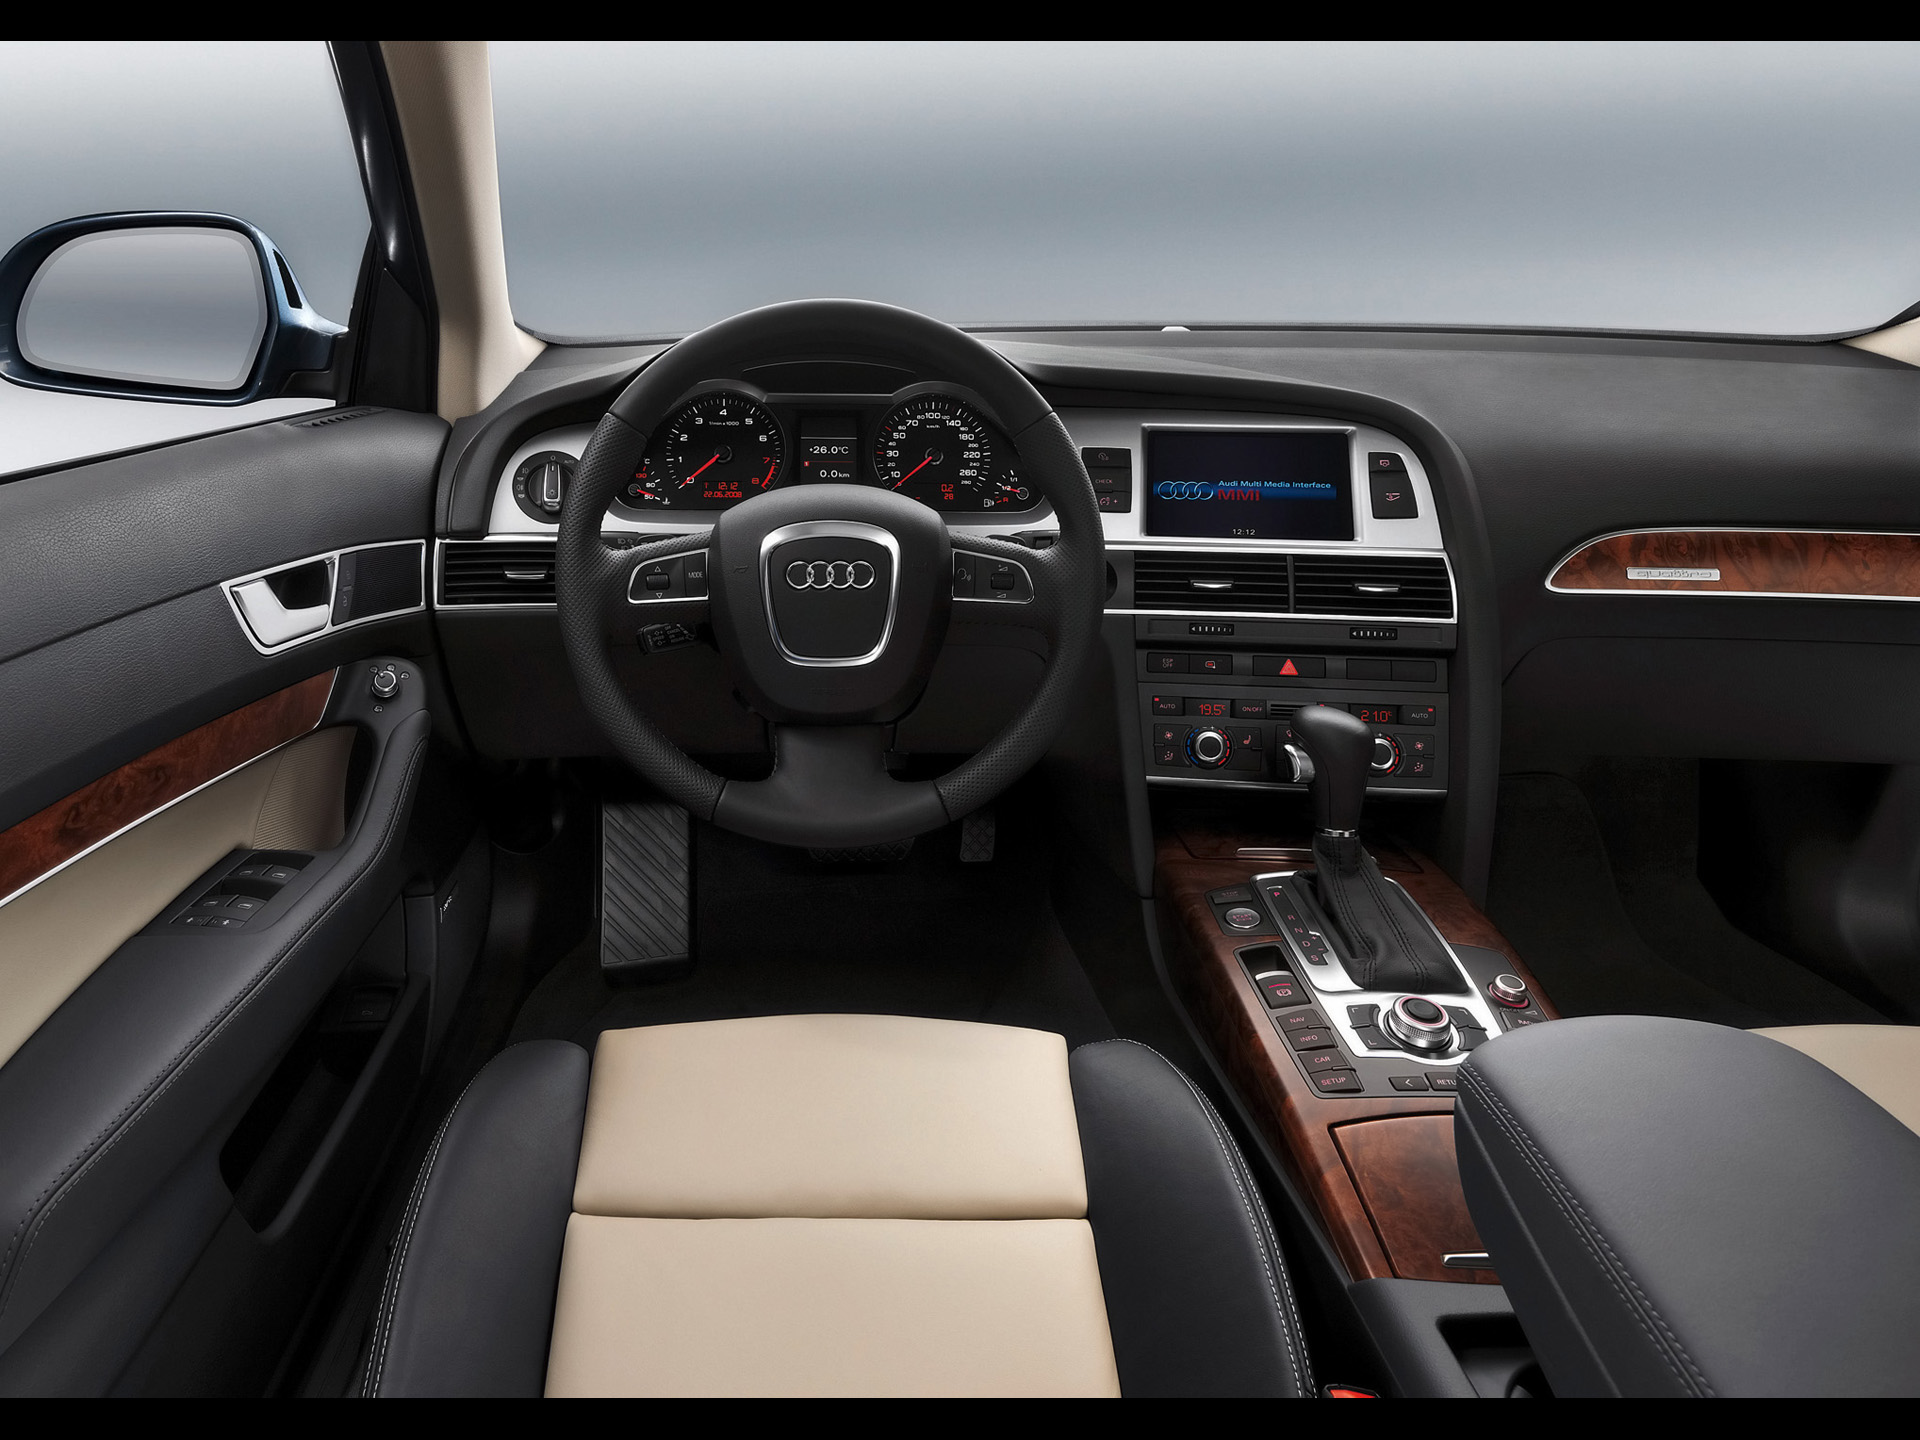 2009 Audi A6 Image 16